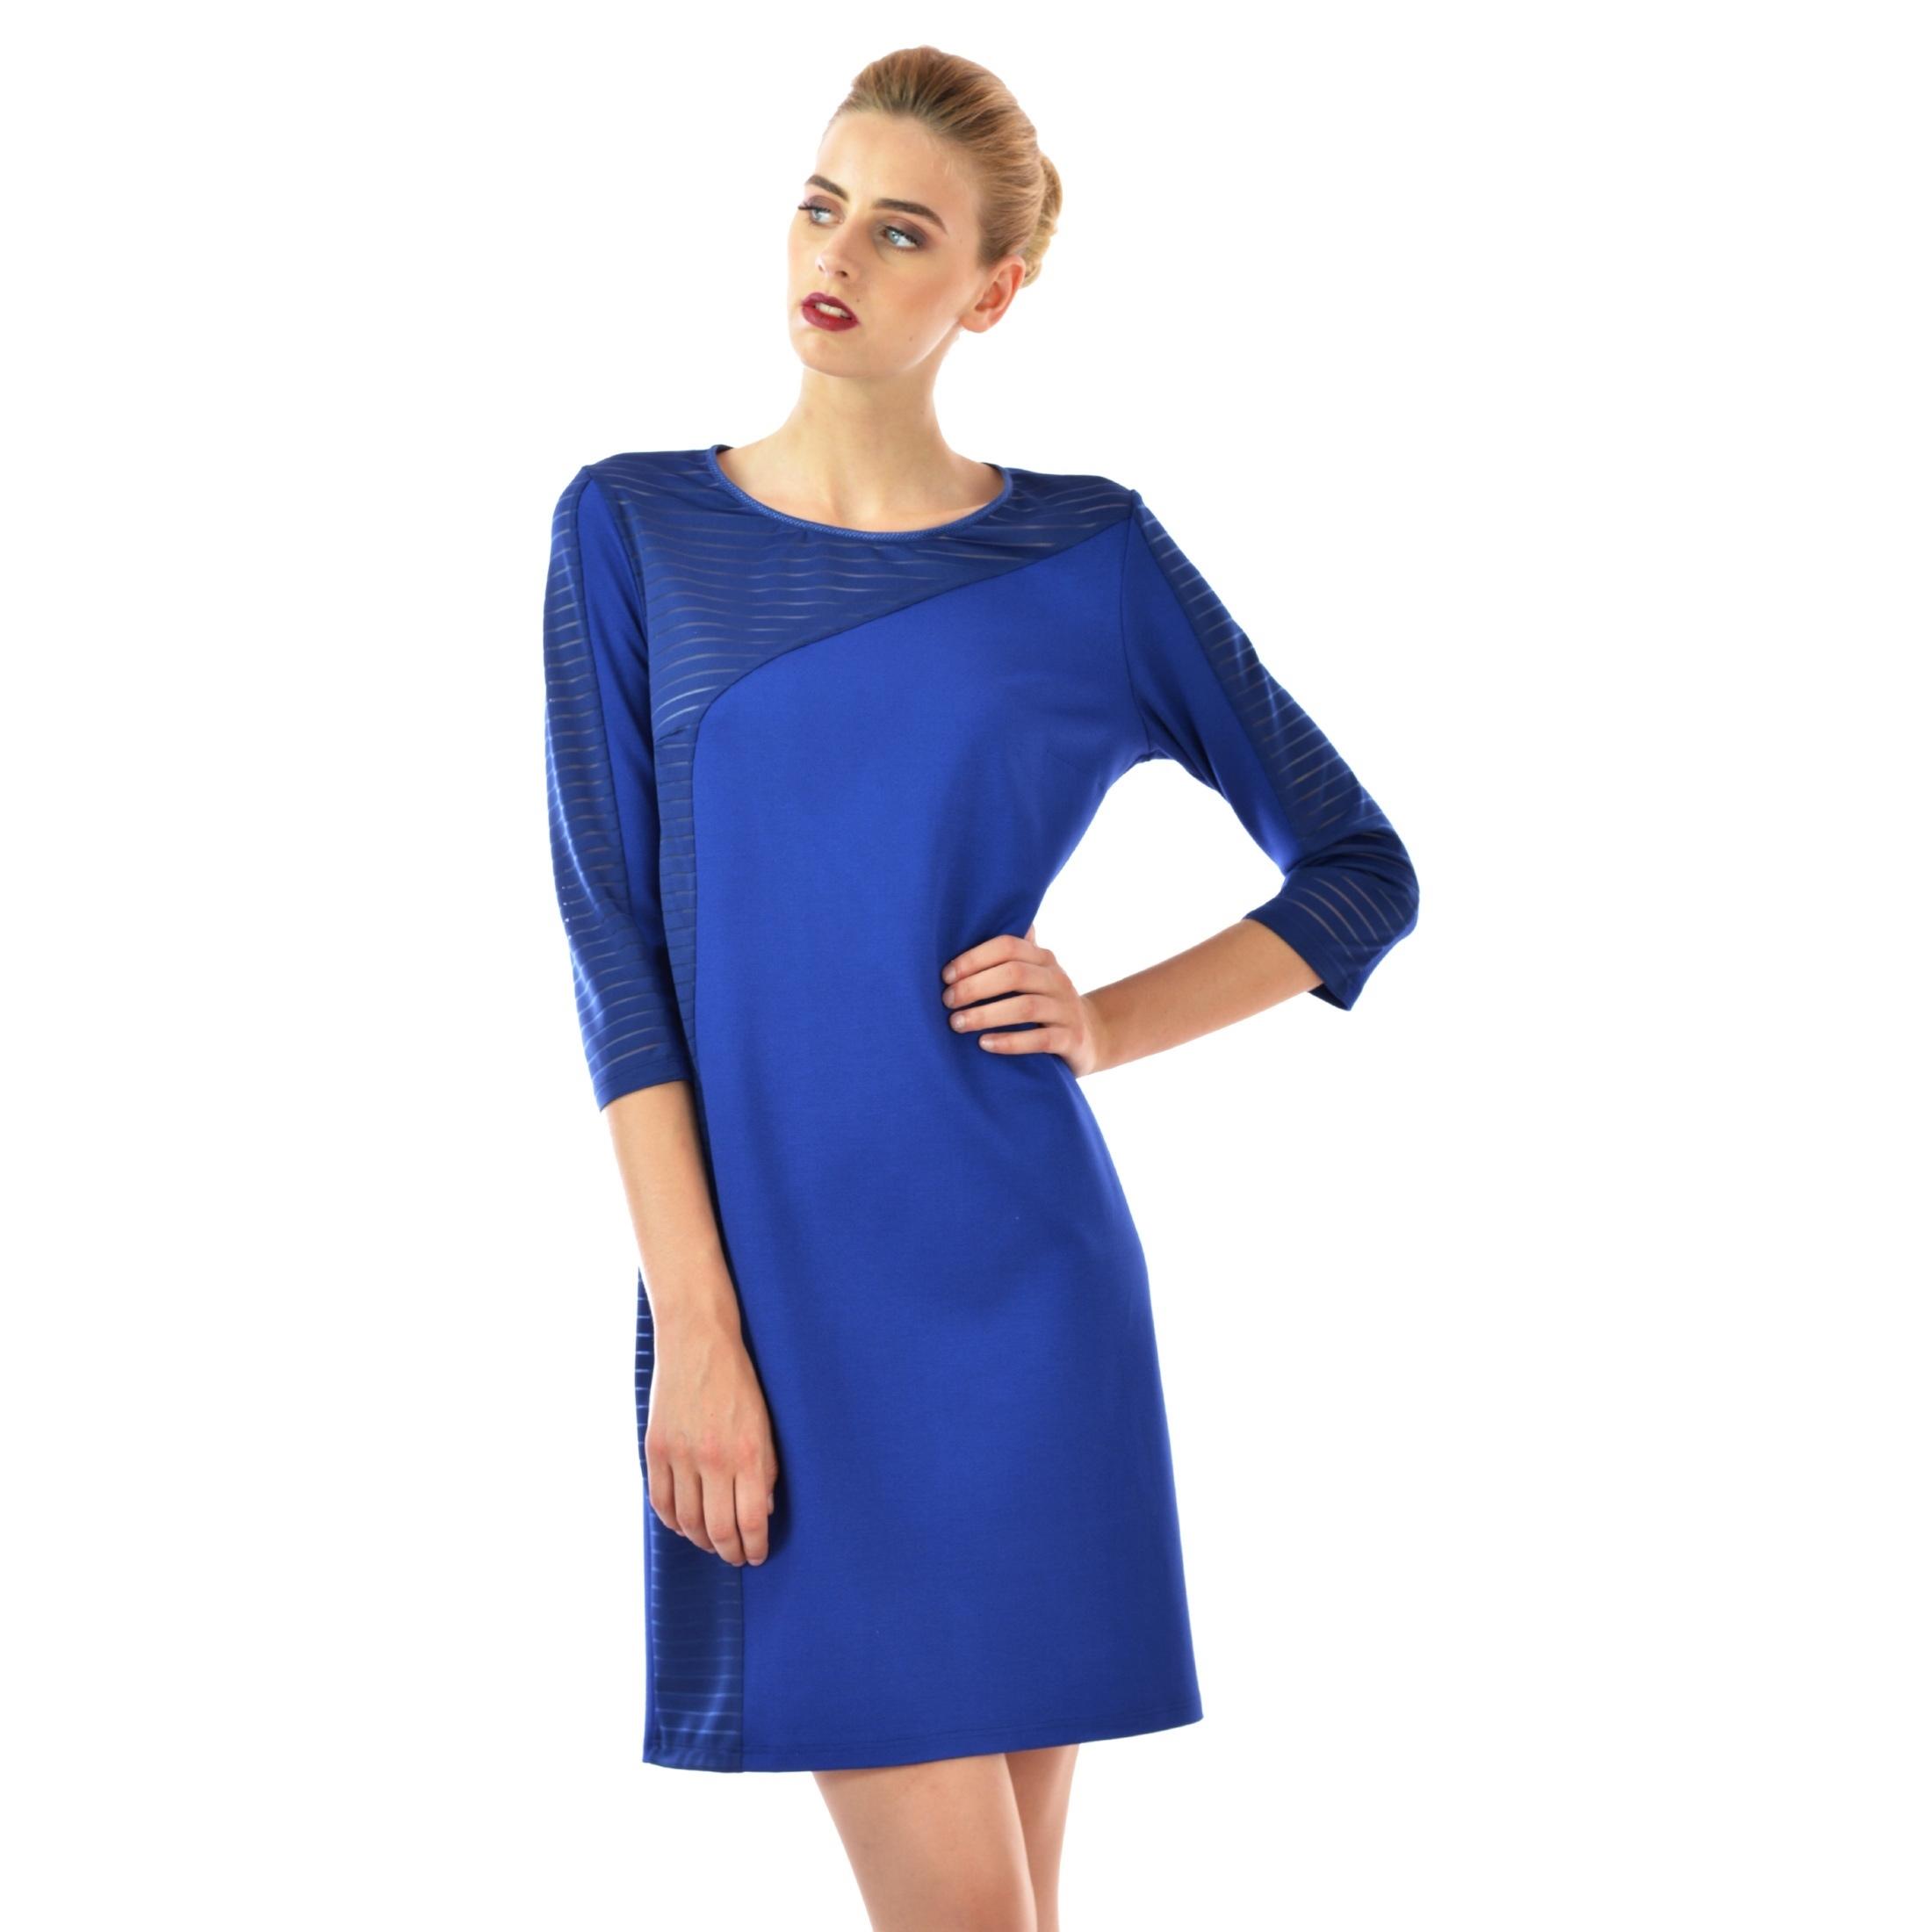 women's dress blue lady m,ženska haljina plava